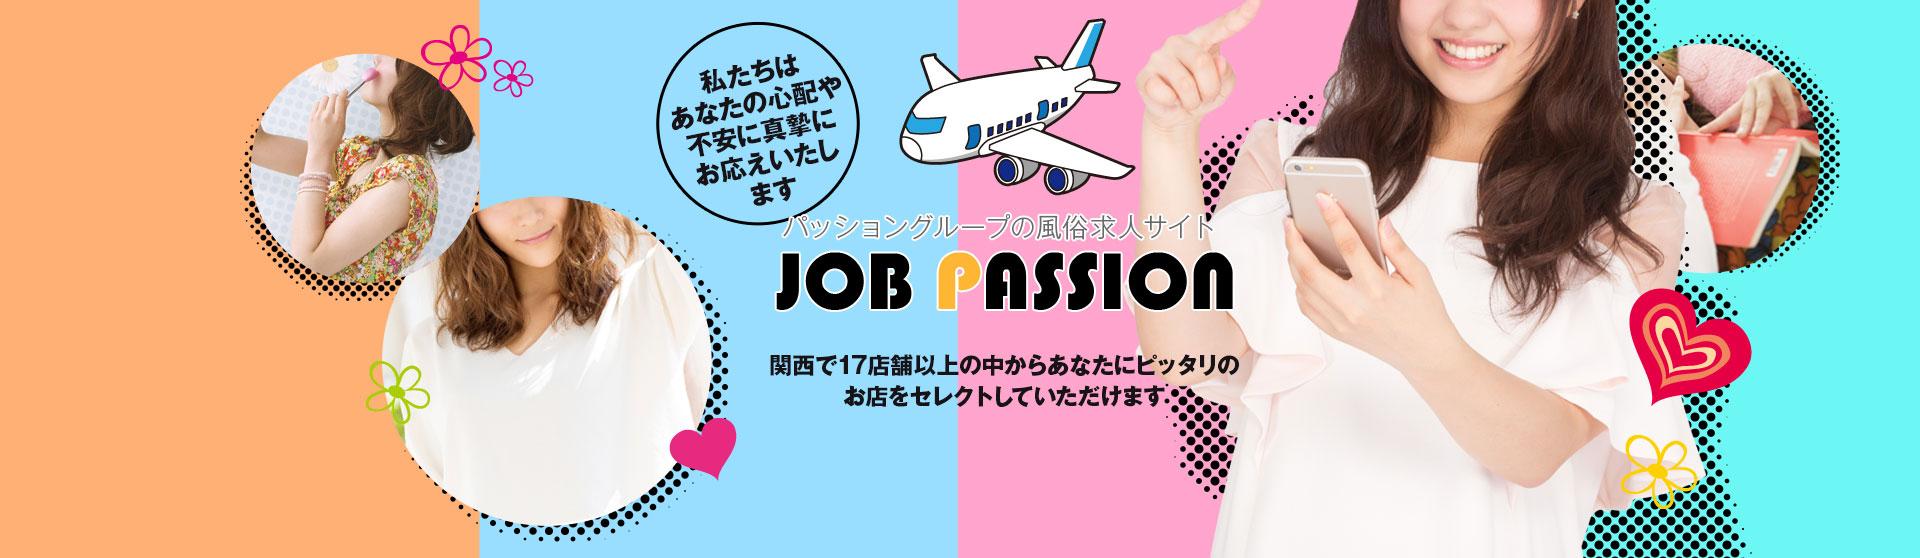 https://job-passion.com/img/index/enter.jpg